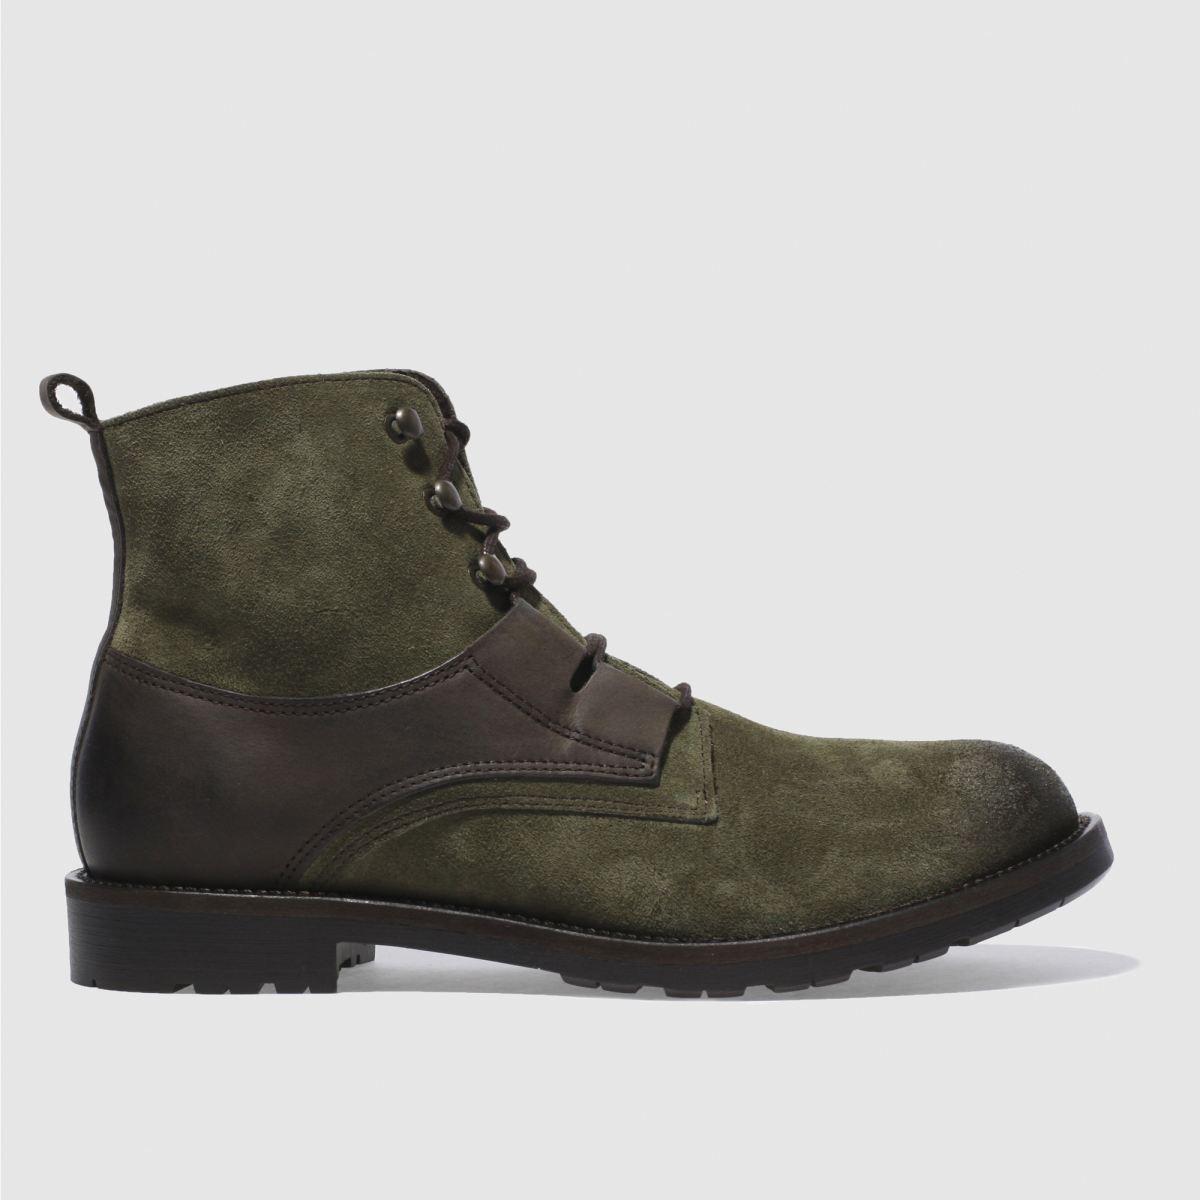 schuh khaki duke ghilli boots